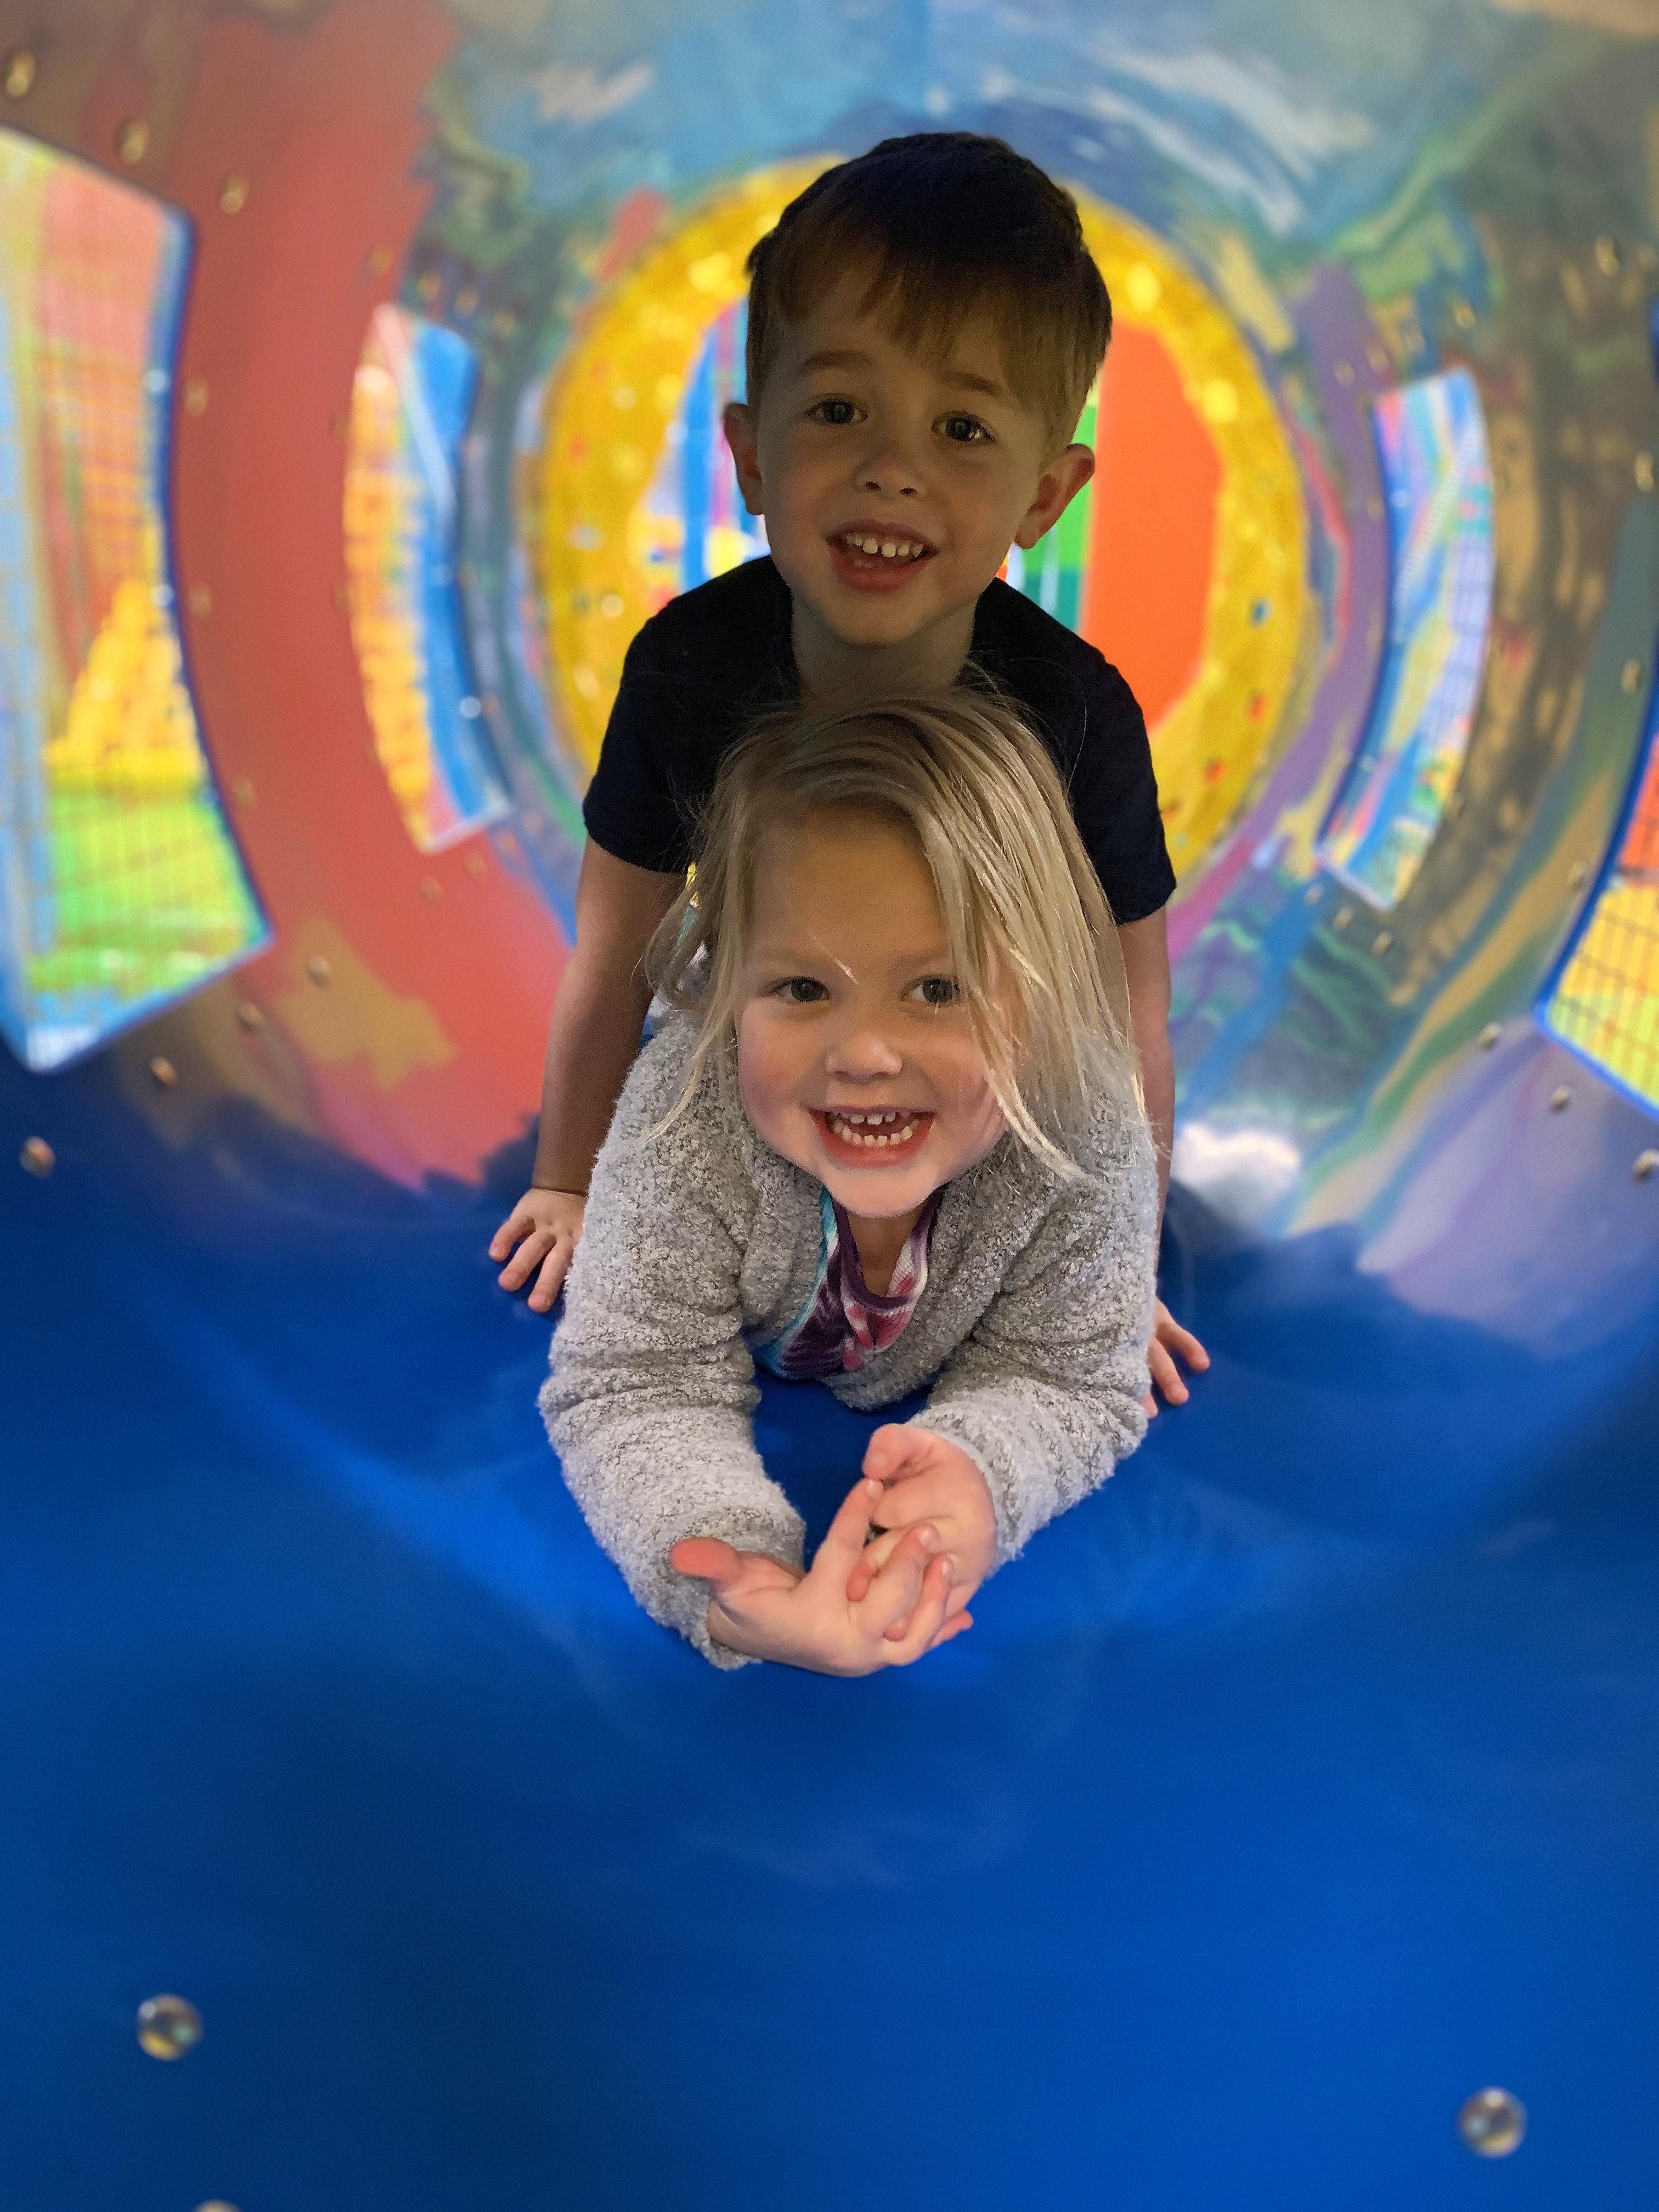 Summer Camps Activities 2019 Summer Full Of Fun At Main Street